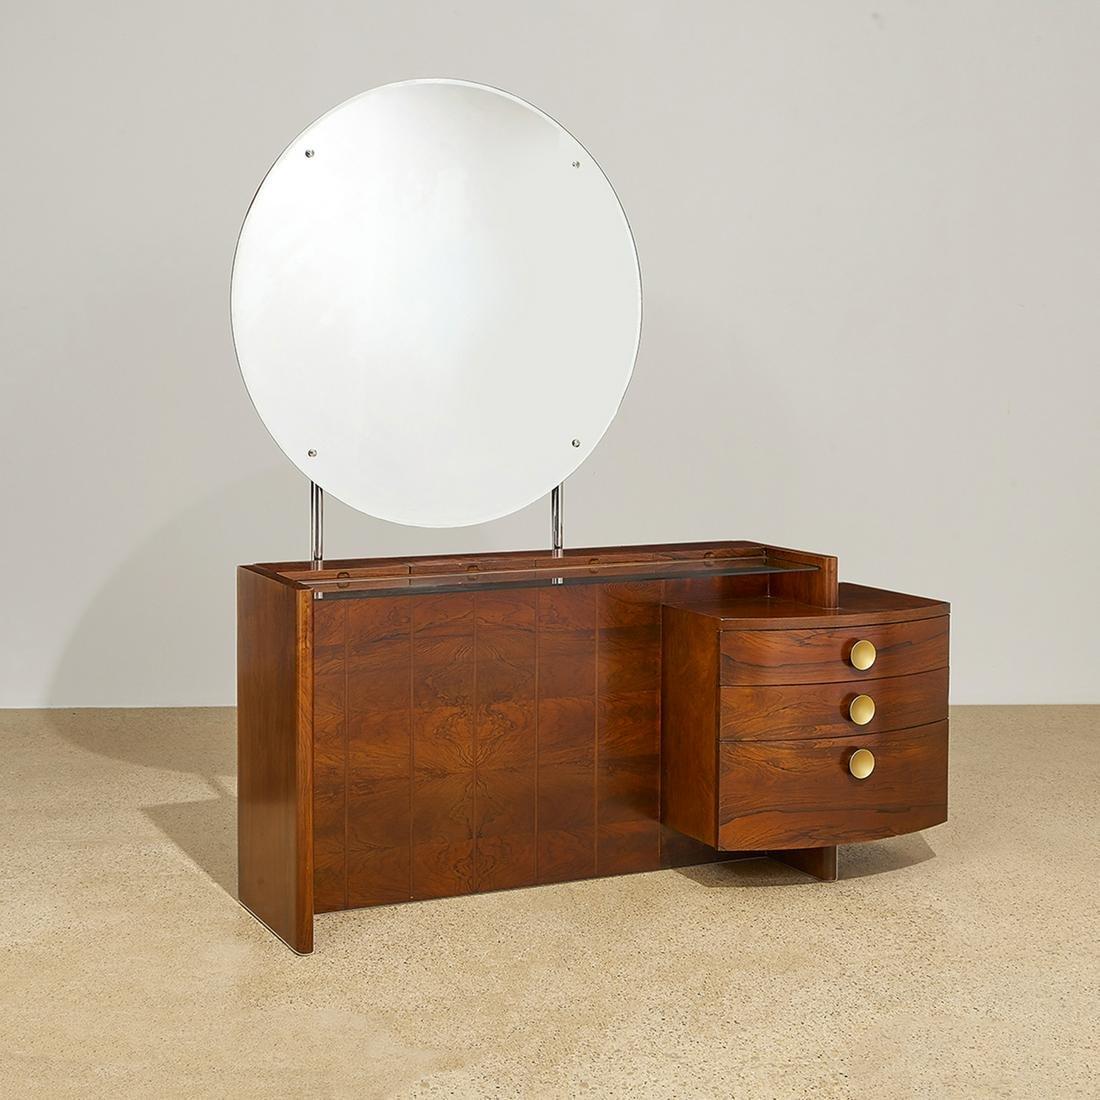 Gilbert Rohde for Herman Miller vanity, #3770